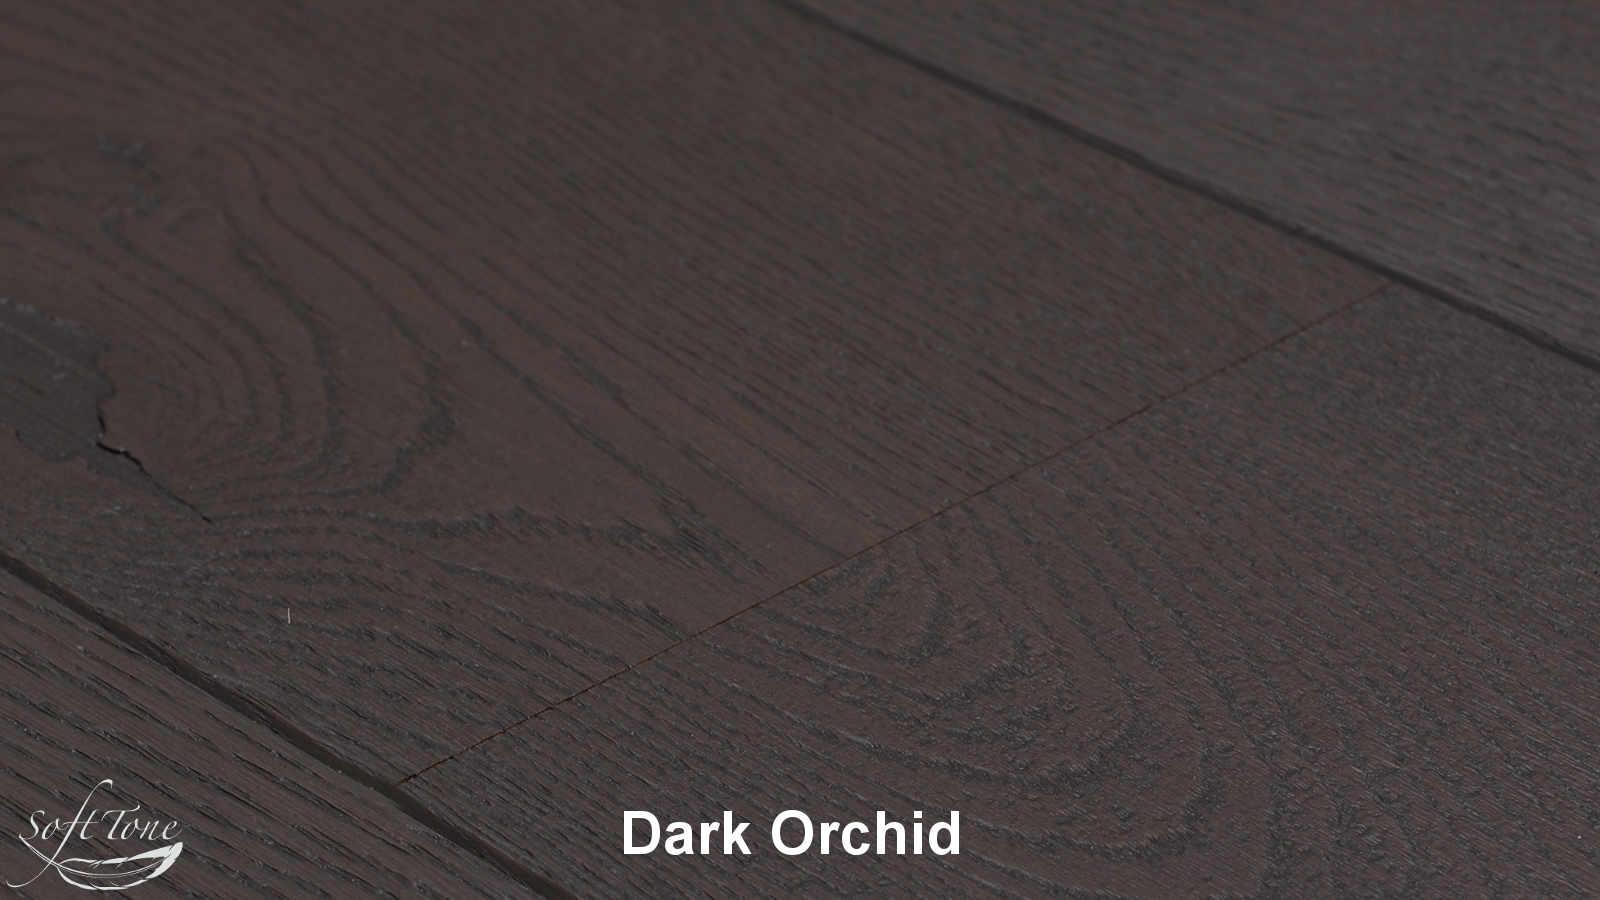 Kolekcja: ESCO Soft Tone, Kolor: Dark Orchid